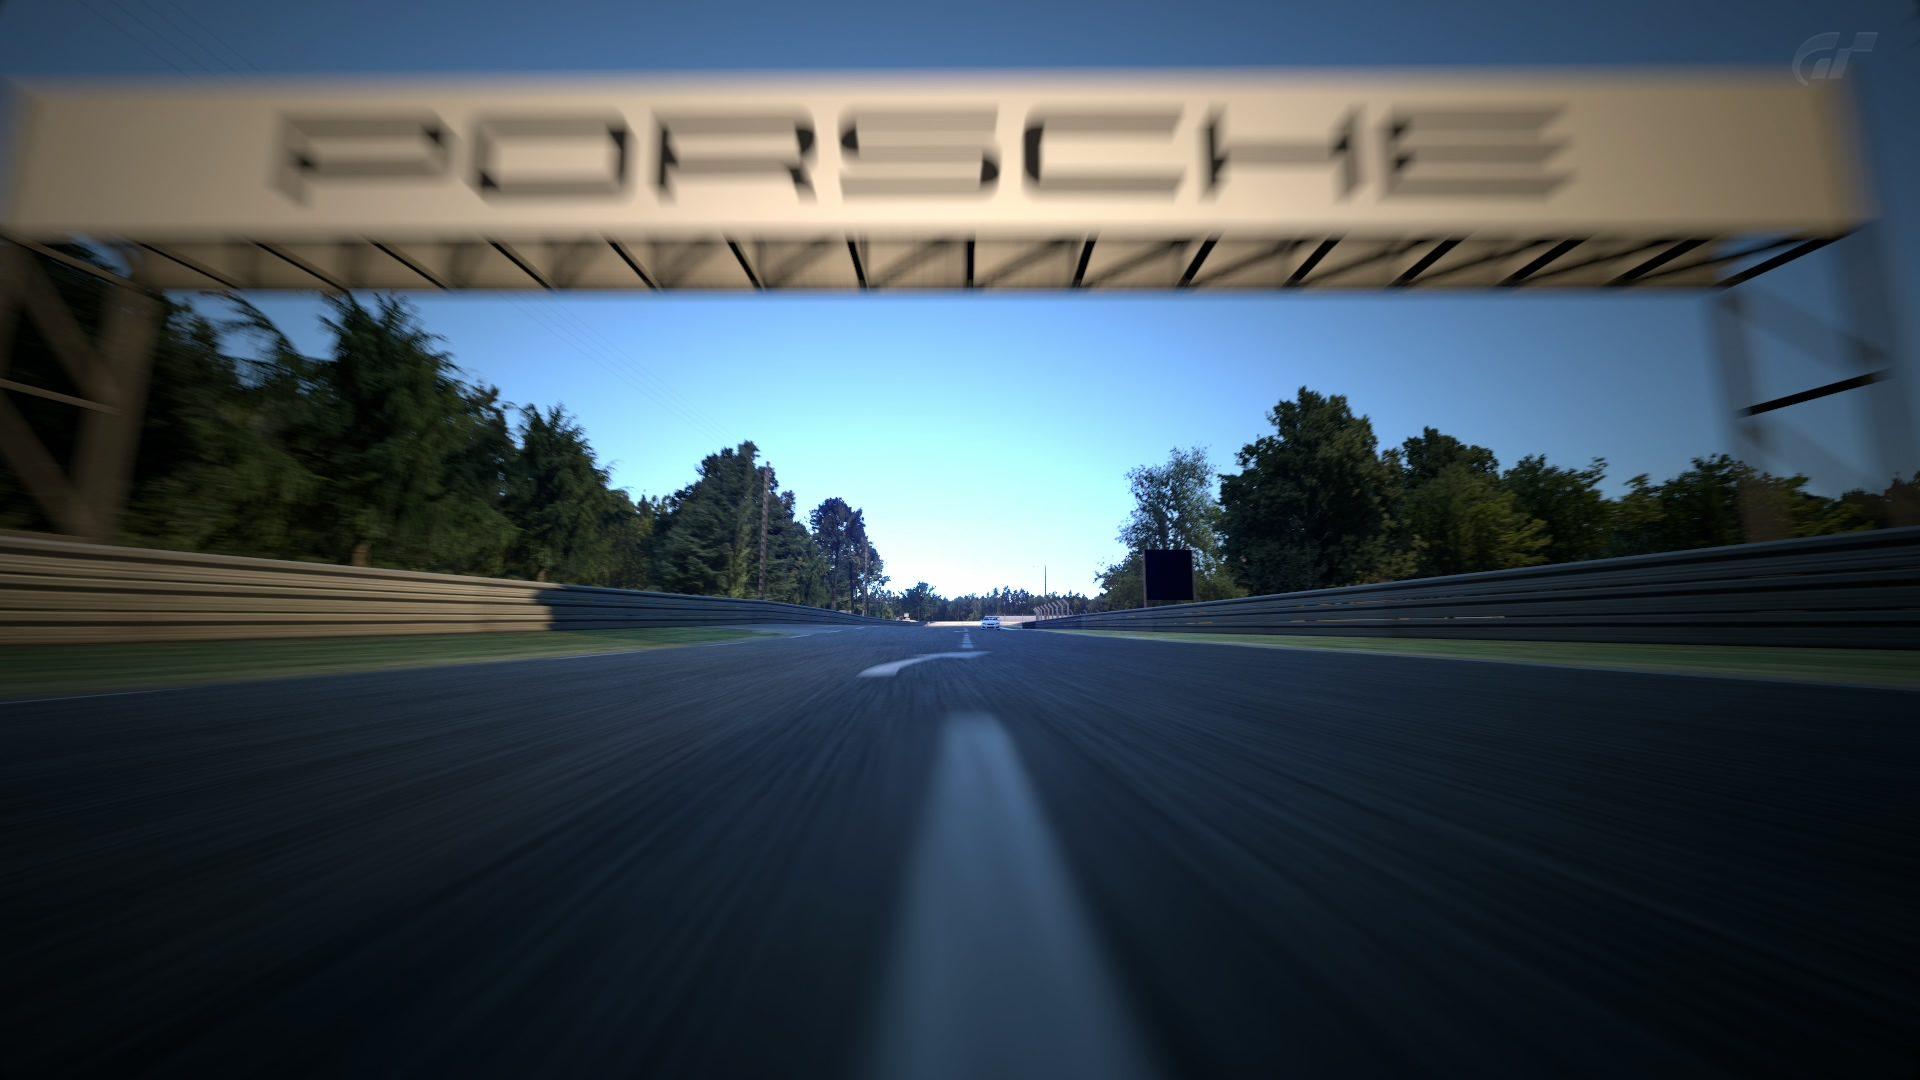 Circuit de la Sarthe 2013_13.jpg